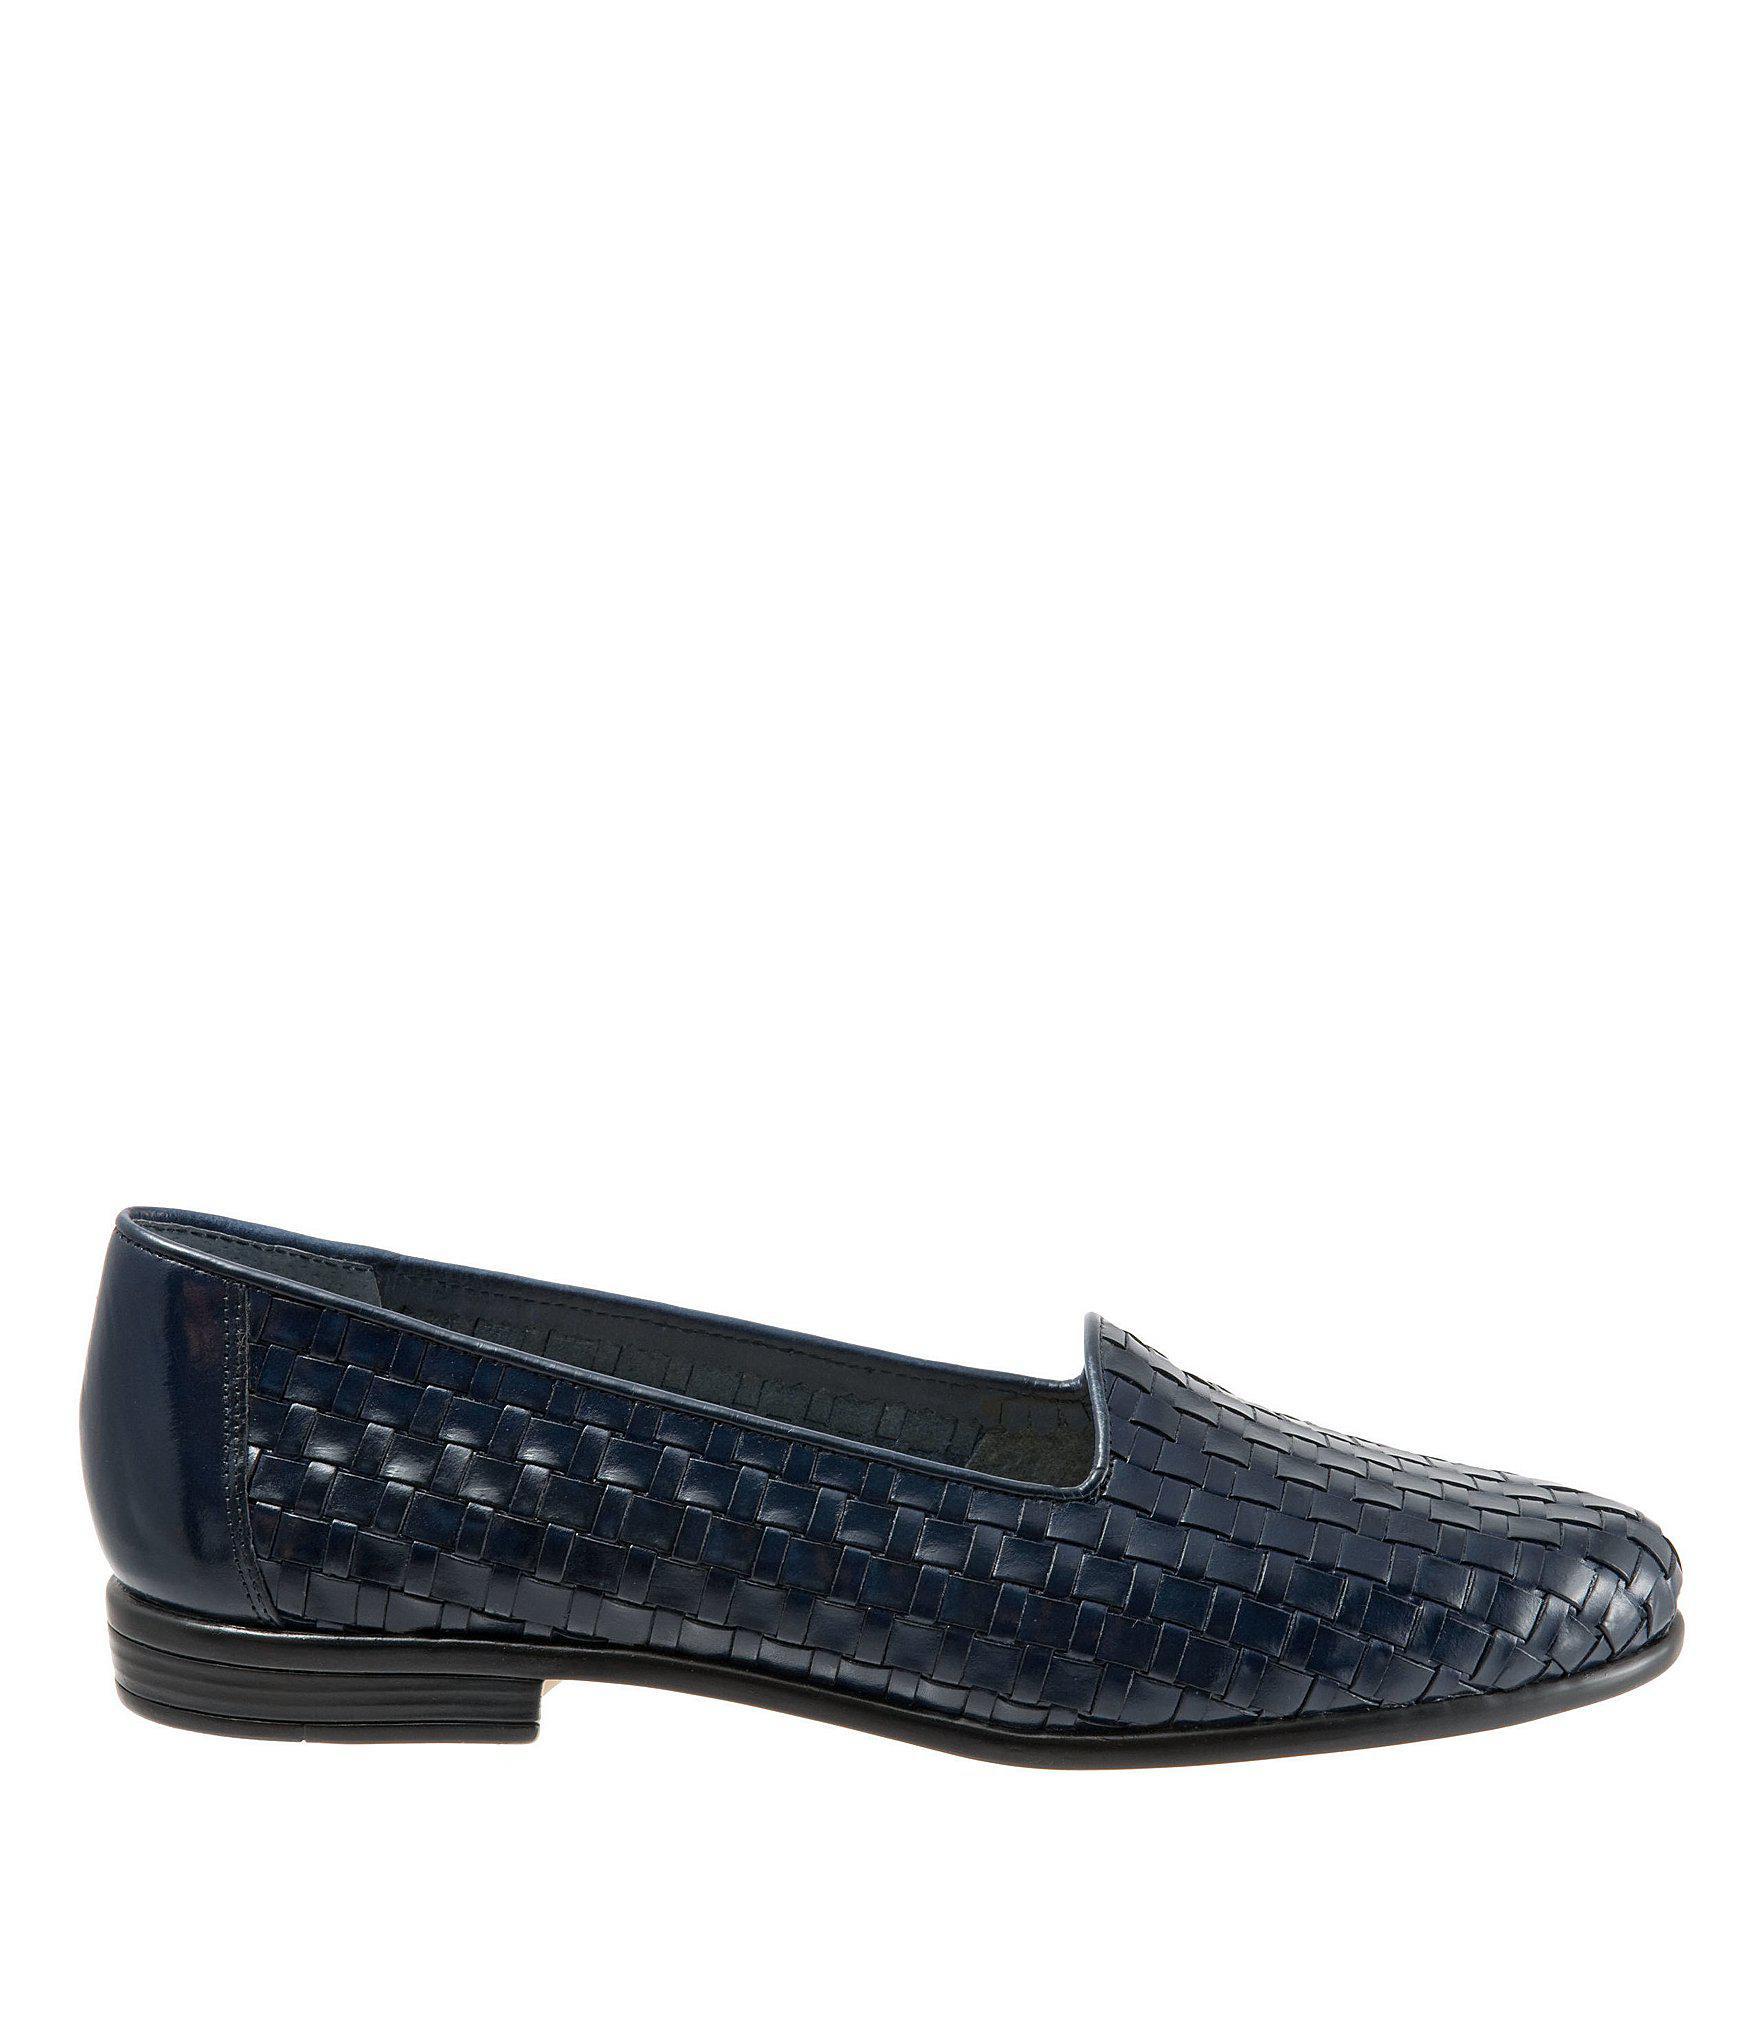 b4c2587f331 Trotters - Blue Liz Woven Block Heel Loafers - Lyst. View fullscreen